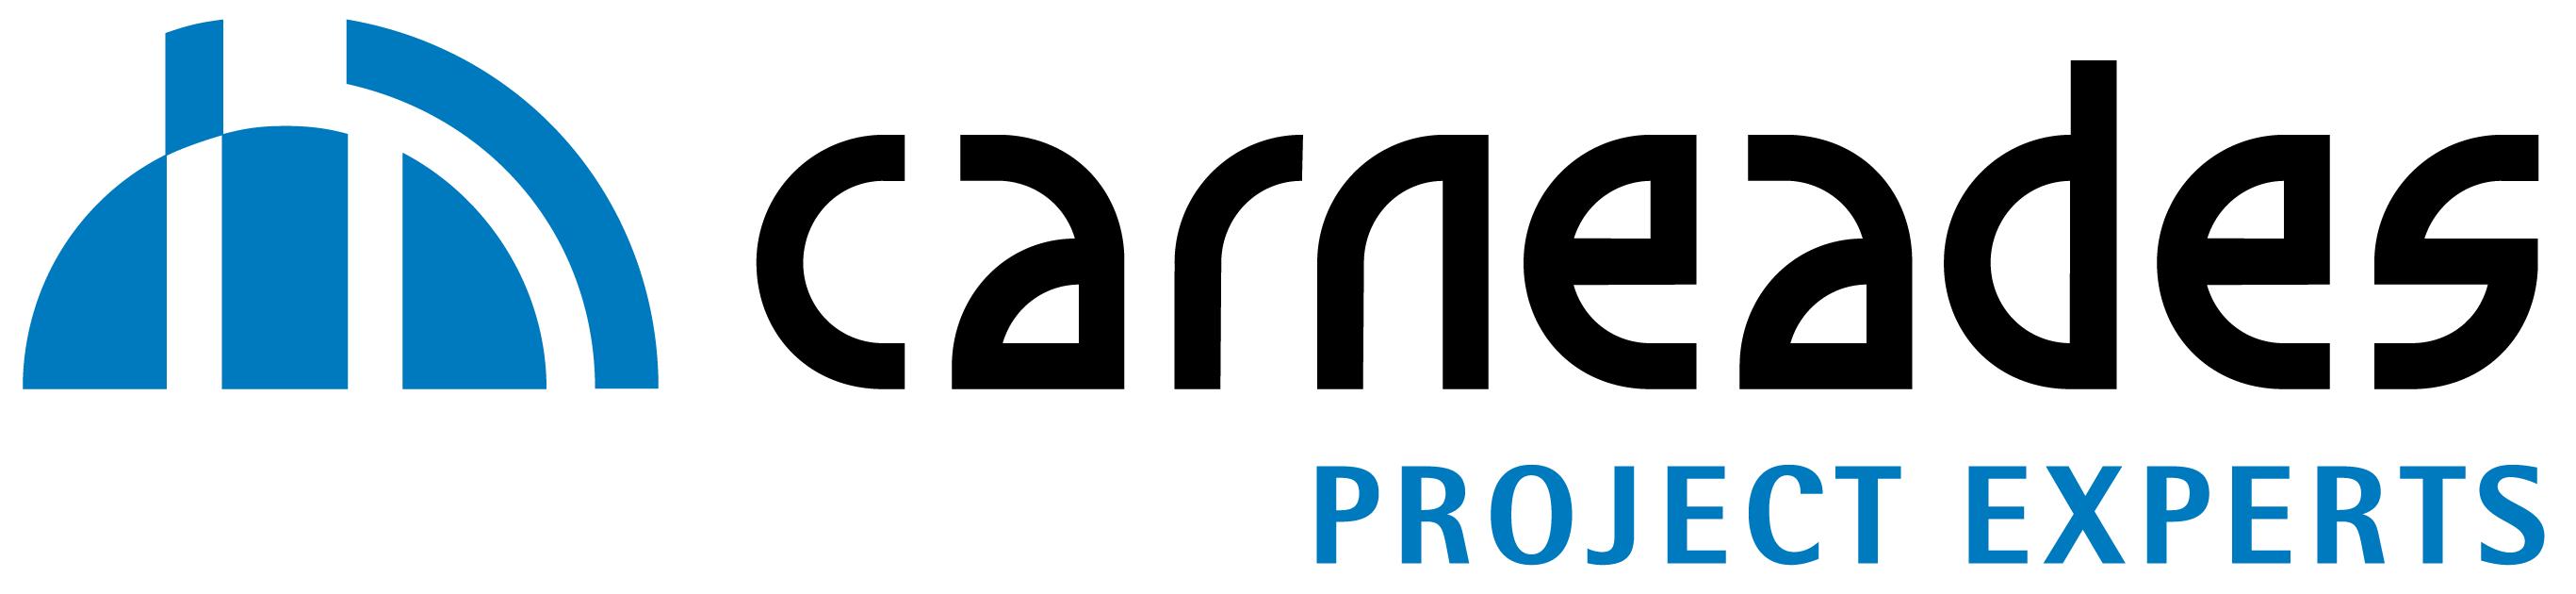 CARNEADES GmbH & Co. KG Braunschweig